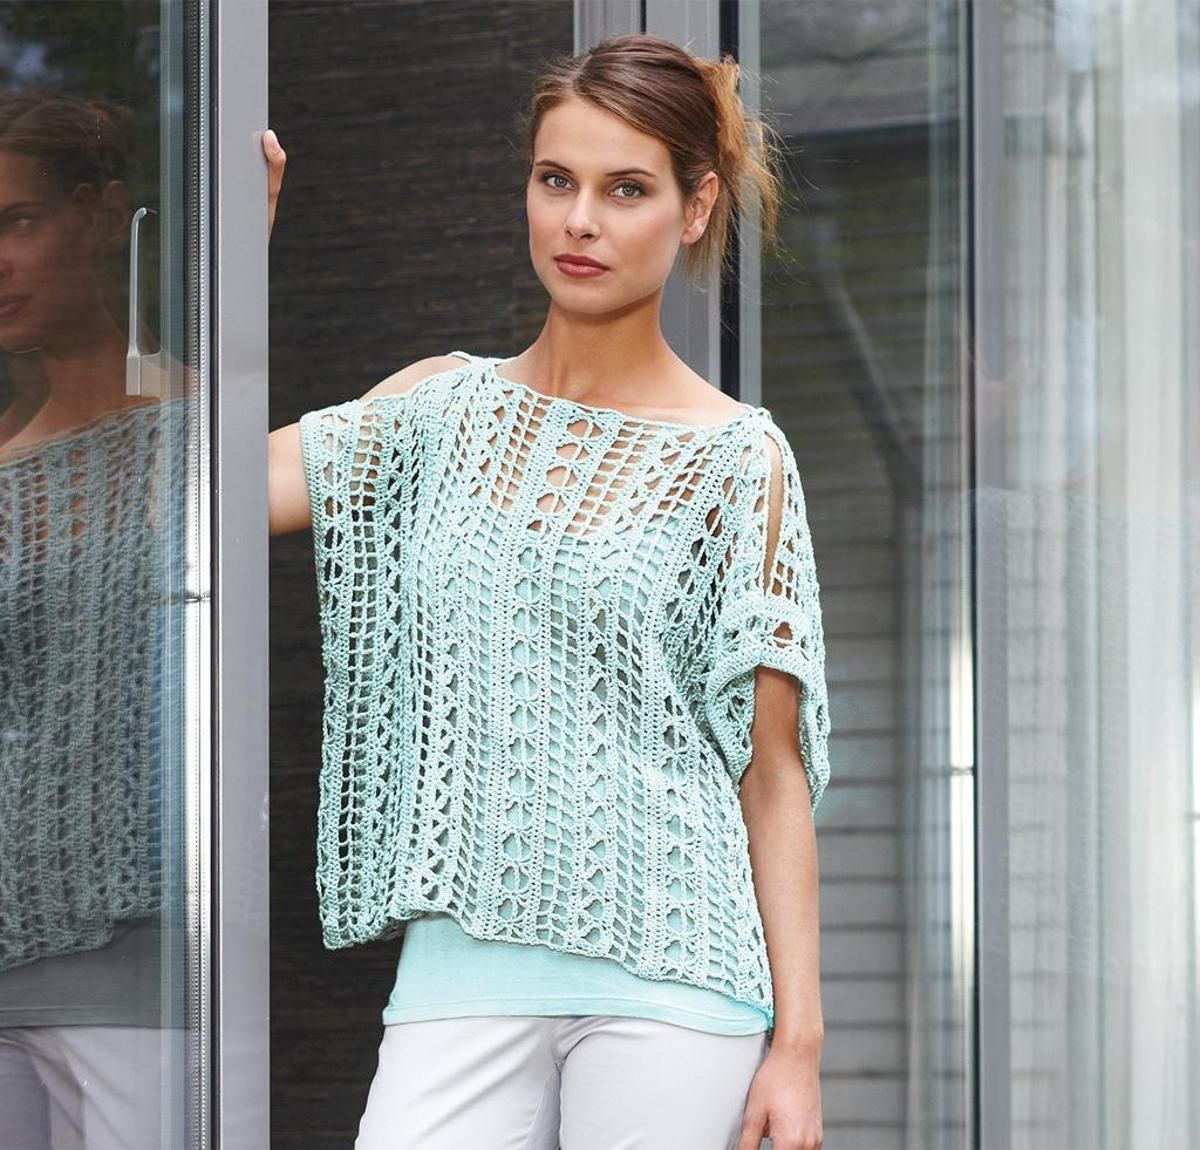 Gulf Coast Top Crochet Kit | Catania, Crochet and Patterns